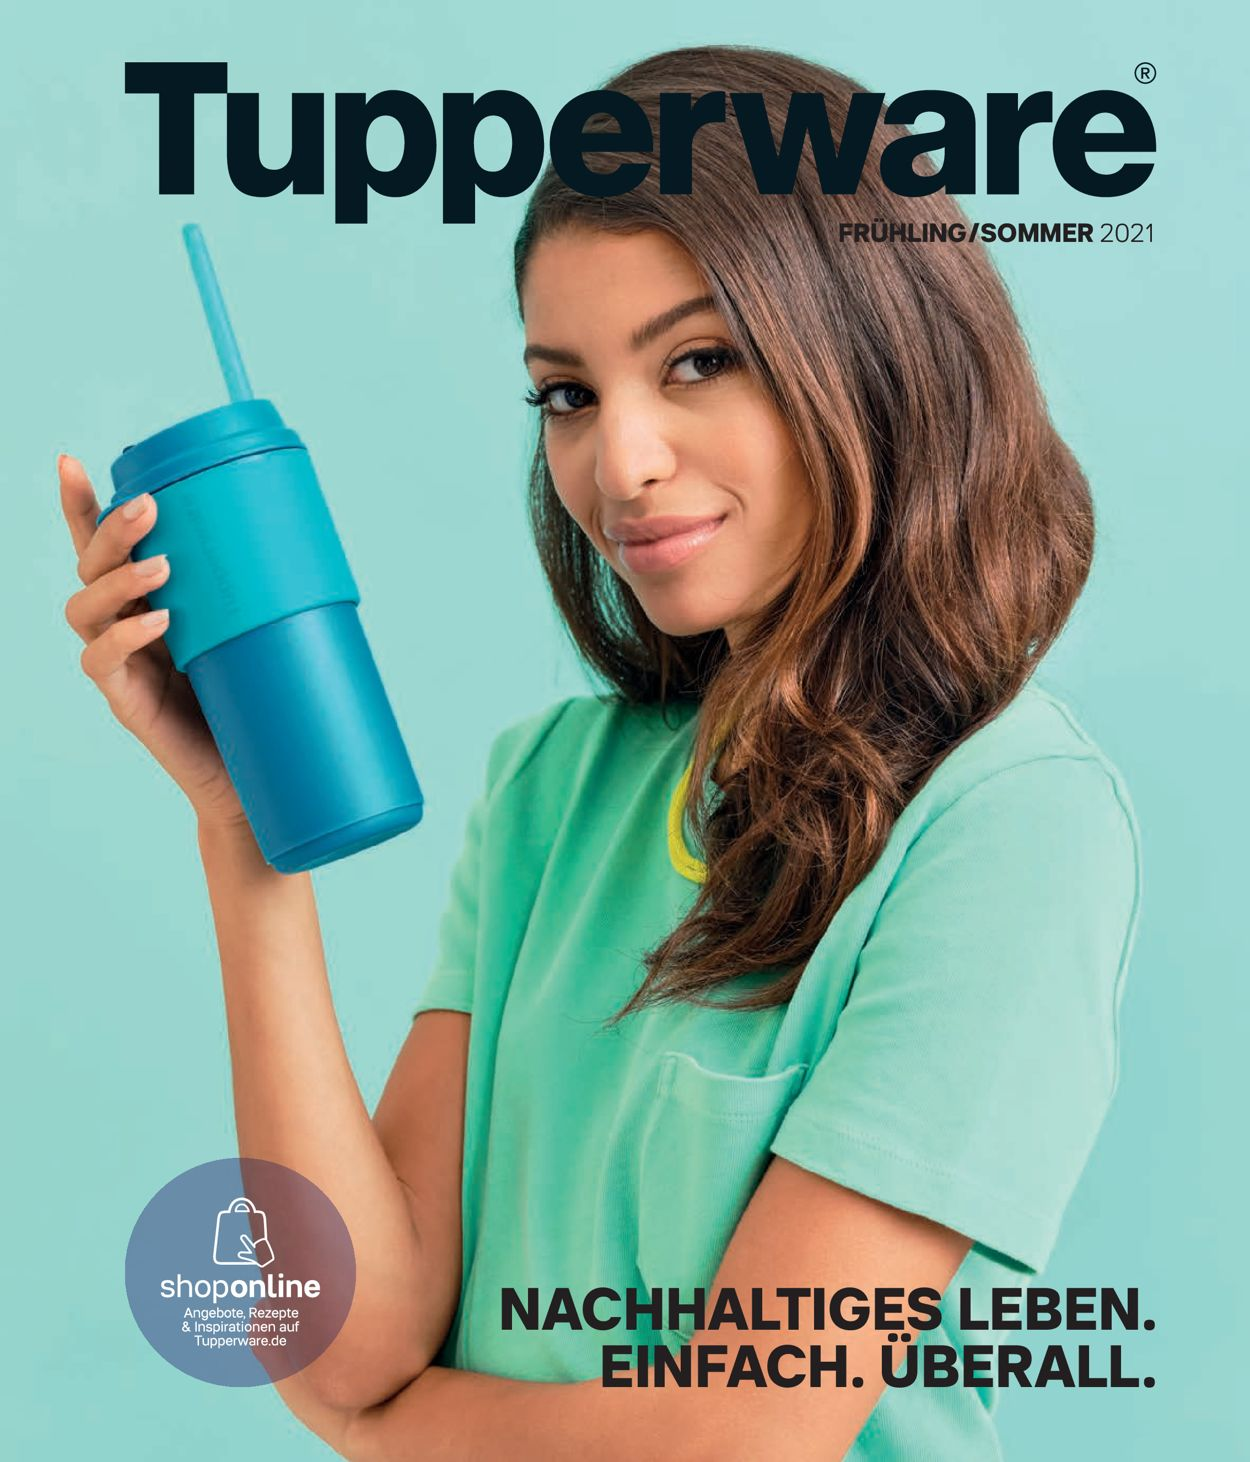 Tupperware Prospekt - Aktuell vom 01.05-31.05.2021